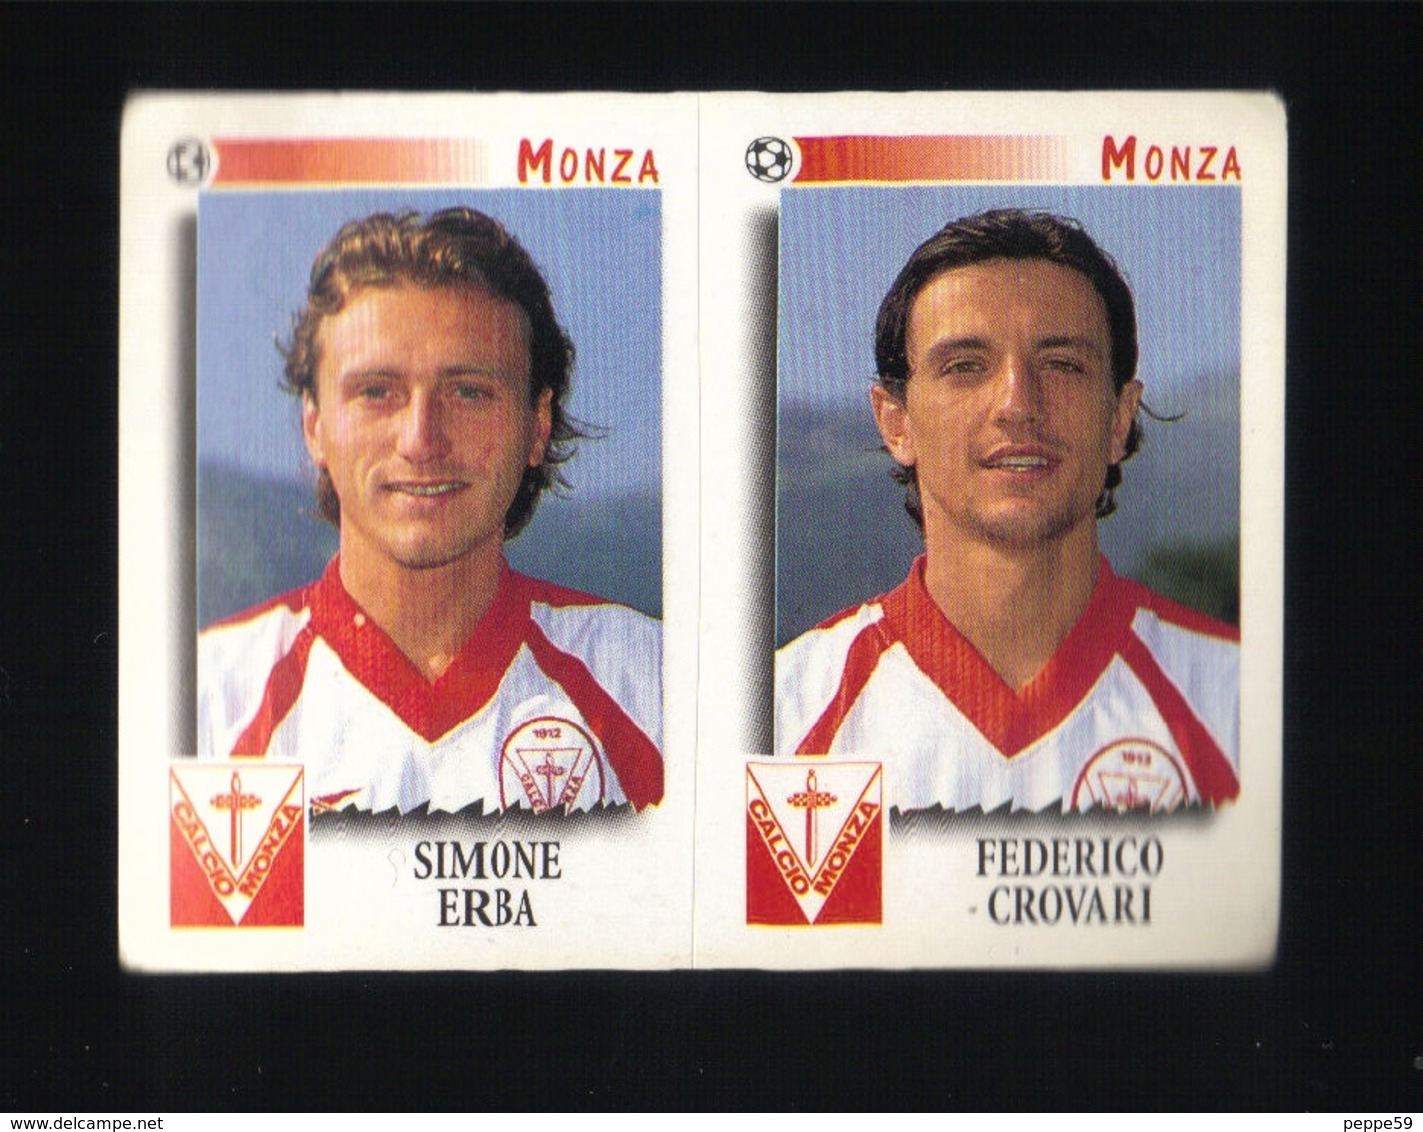 Figurina Calciatori Italiani Panini 1997-1998 - Monza  - N.496   - Football - Soccer - Socker - Fussball - Futbol - Panini